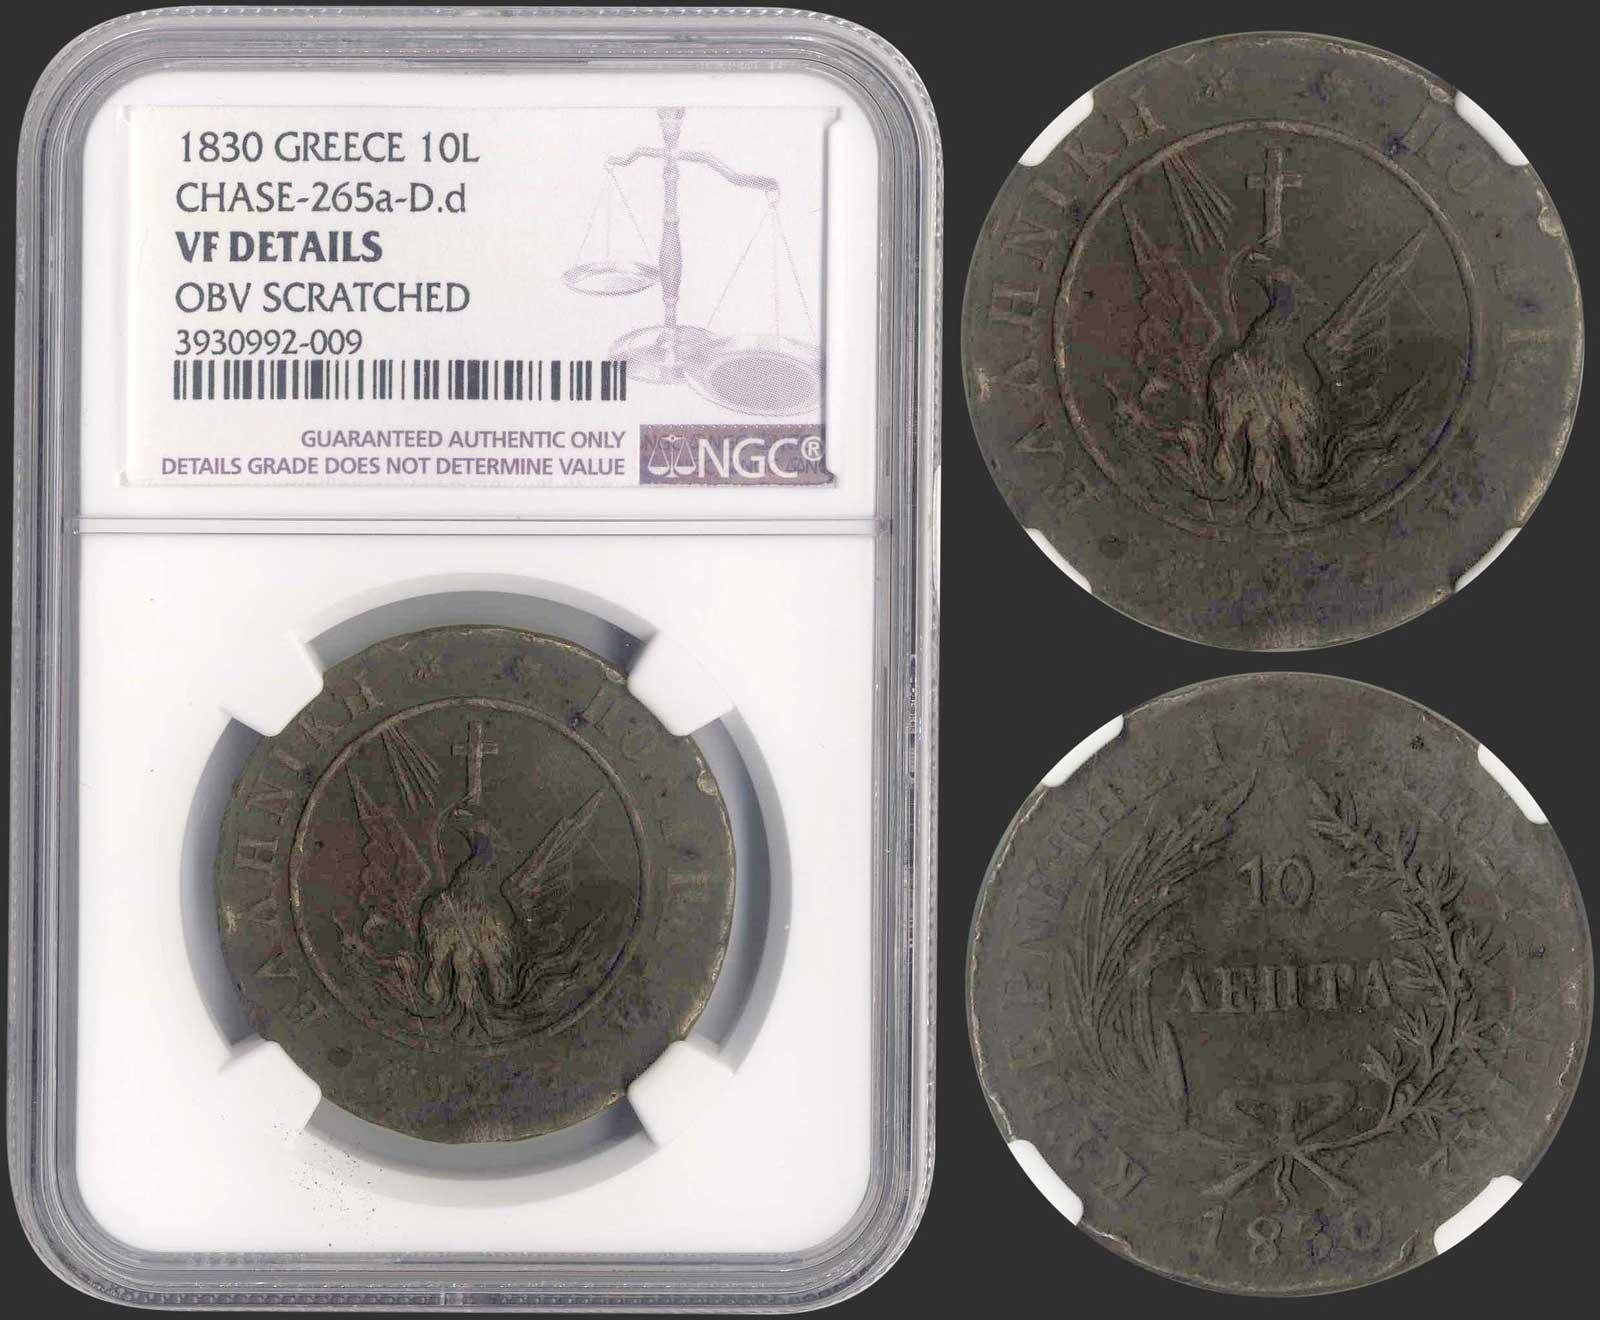 Lot 9015 - GREECE-  COINS & TOKENS governor capodistrias -  A. Karamitsos Public & LIVE Bid Auction 610 Coins, Medals & Banknotes